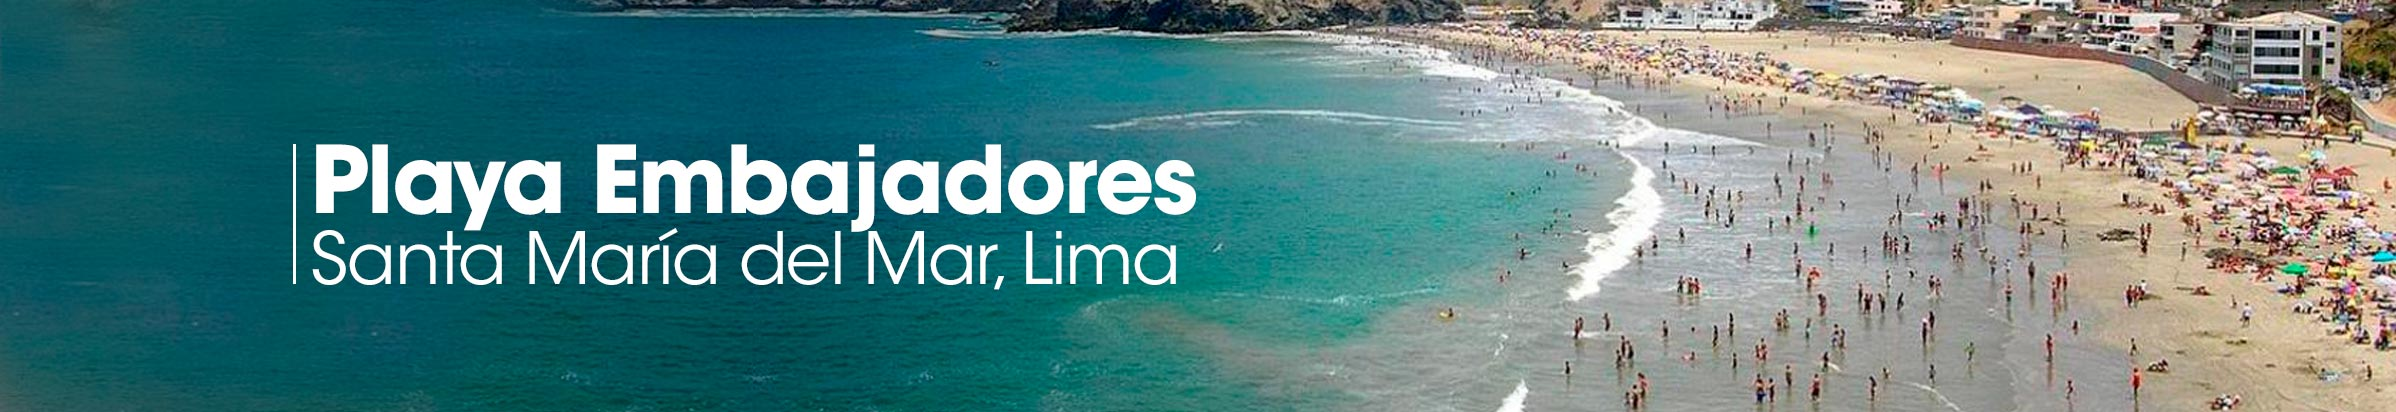 Blog-Img-PlayasPerú-Embajadores